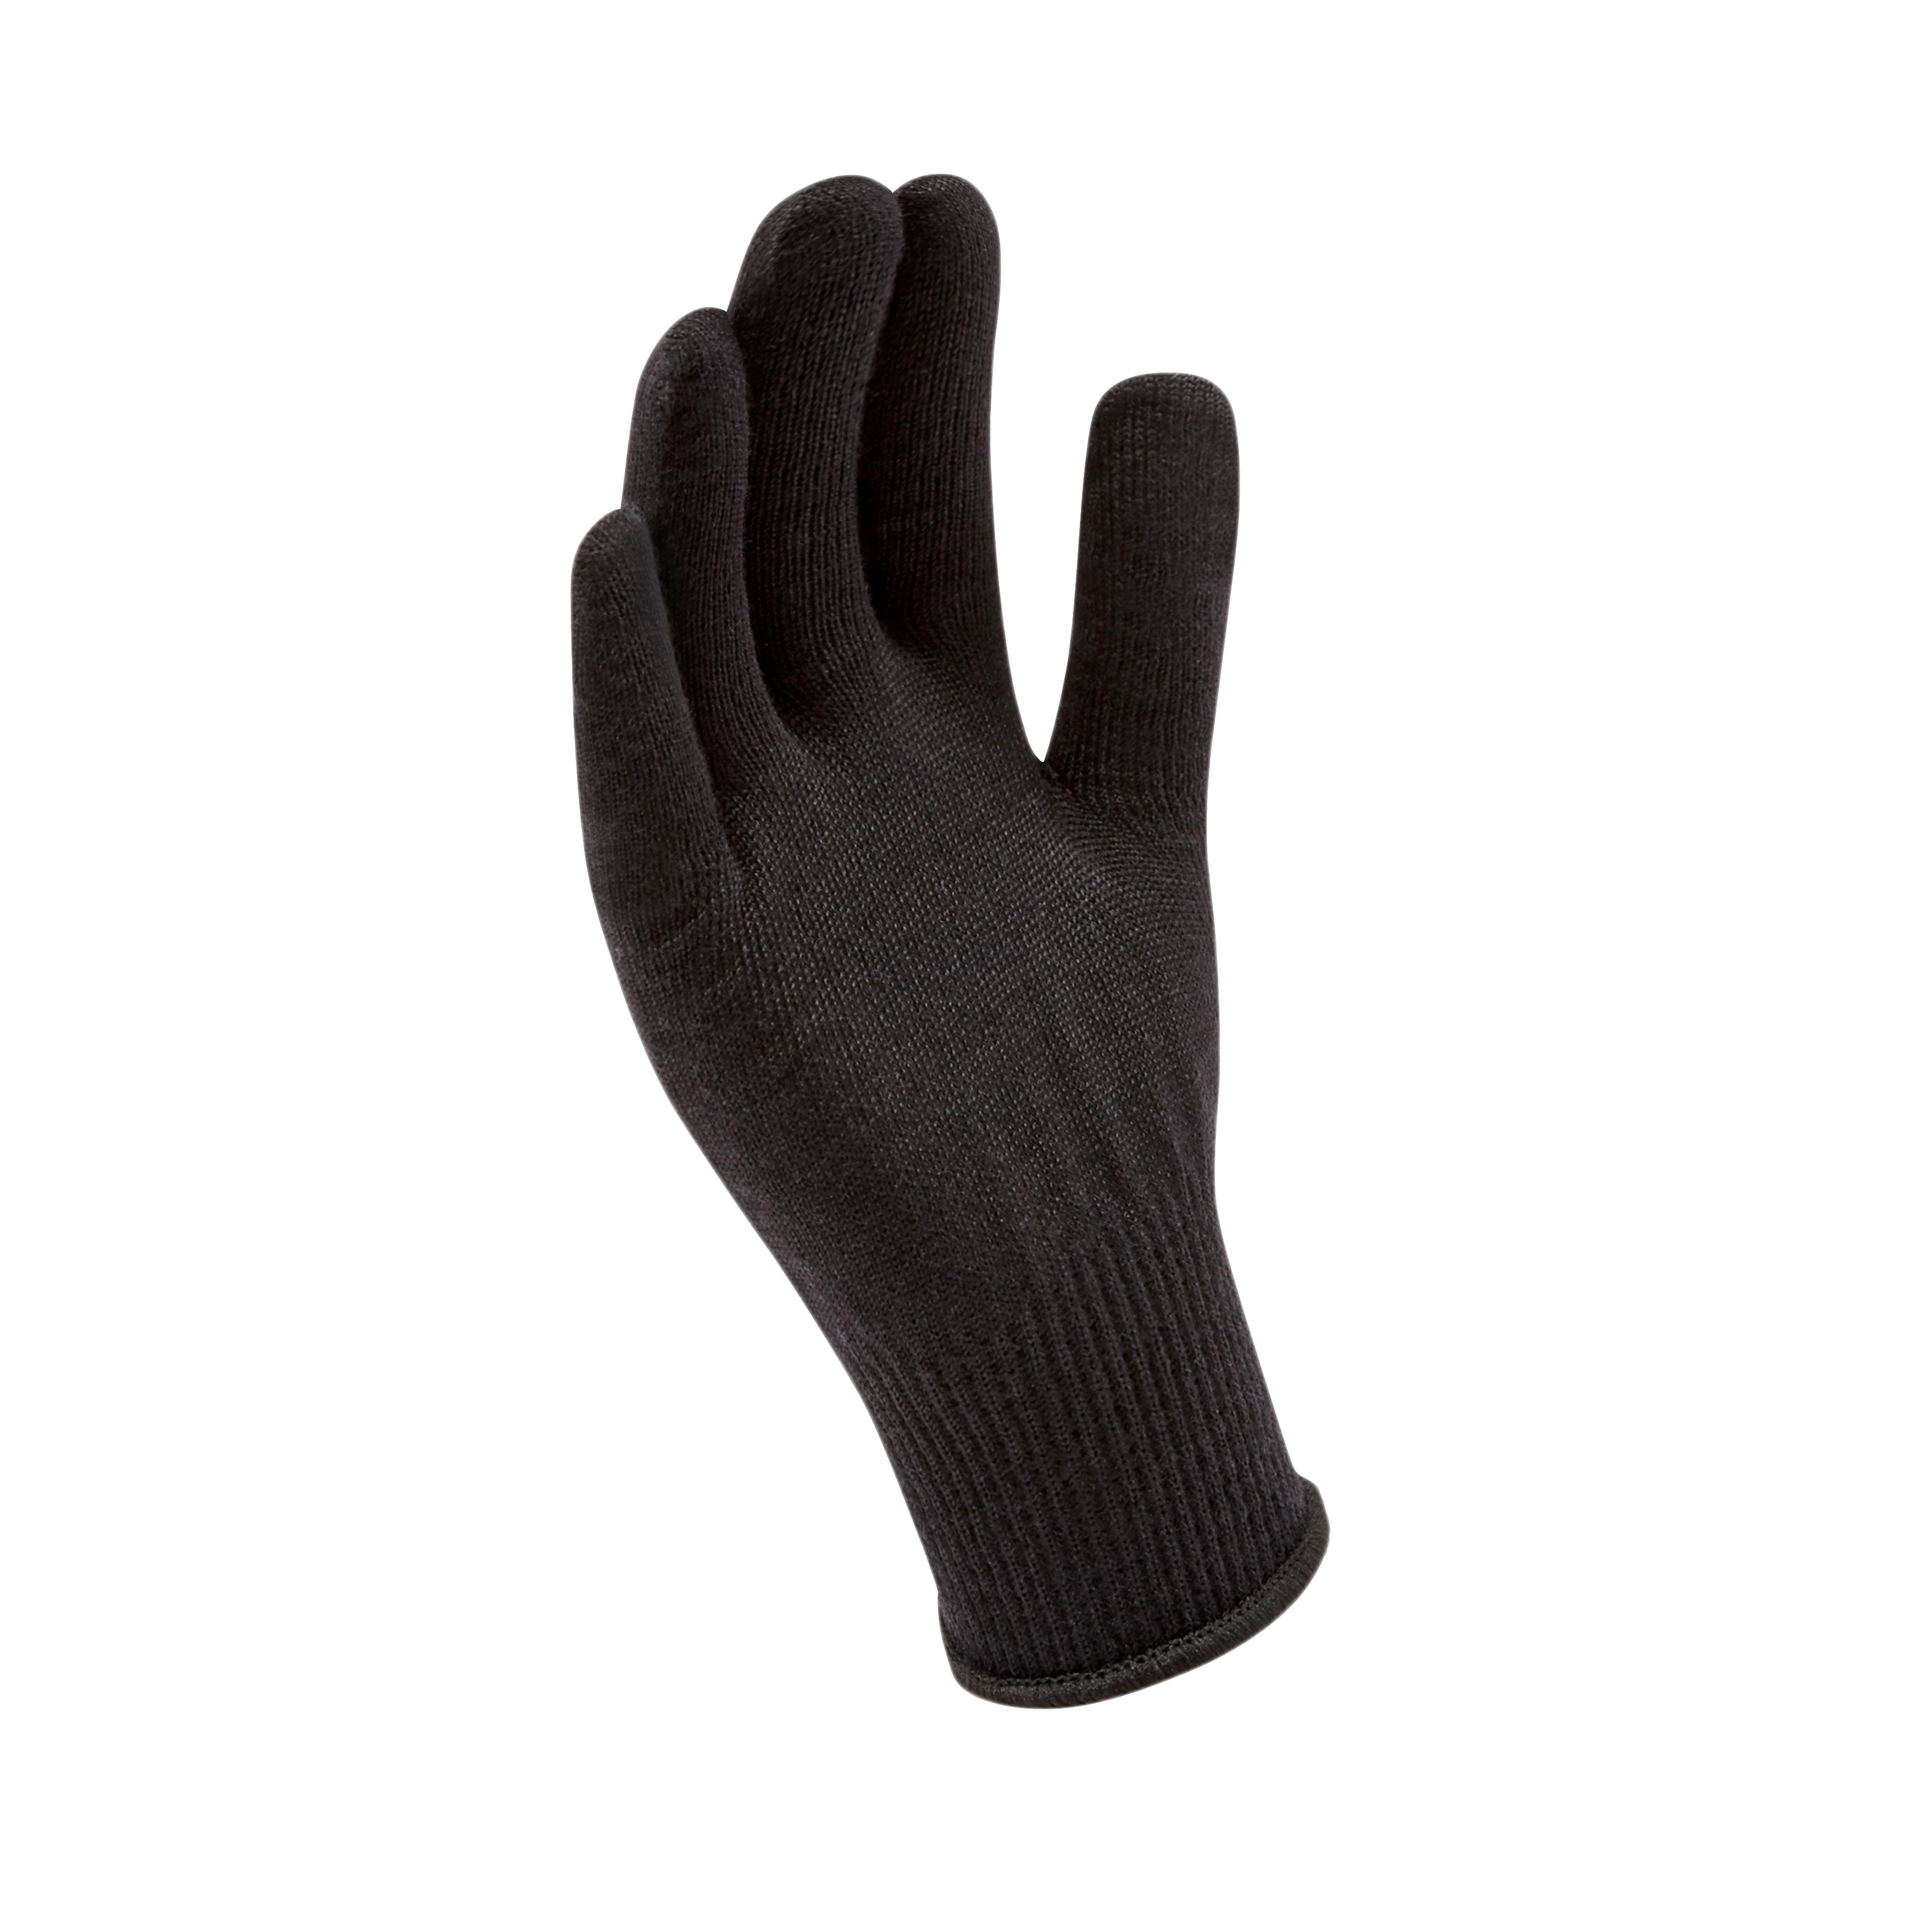 Sealskinz Solo Merino Glove (unisex)